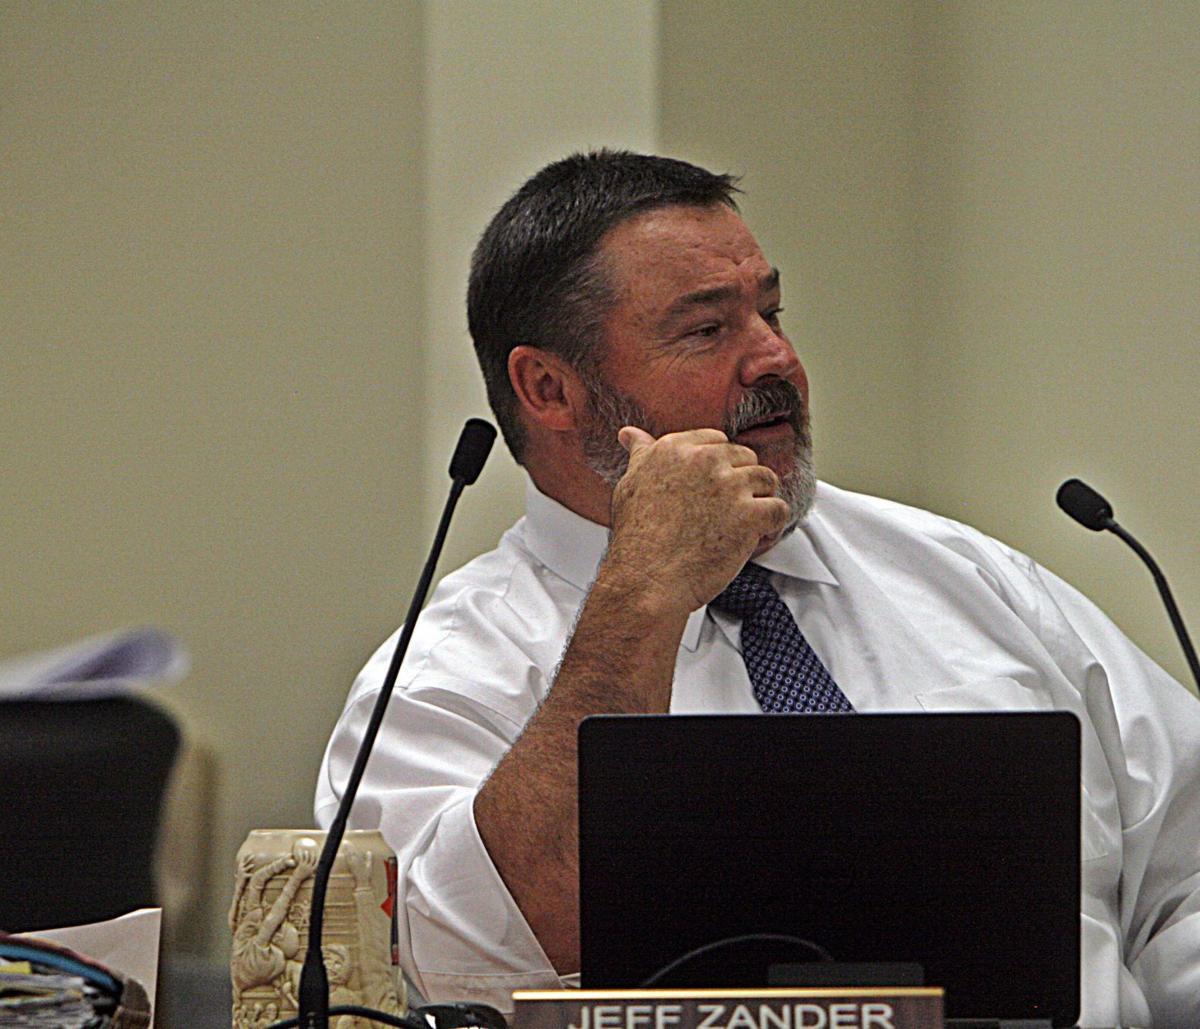 Jeff Zander at school school board meeting Sept 27.